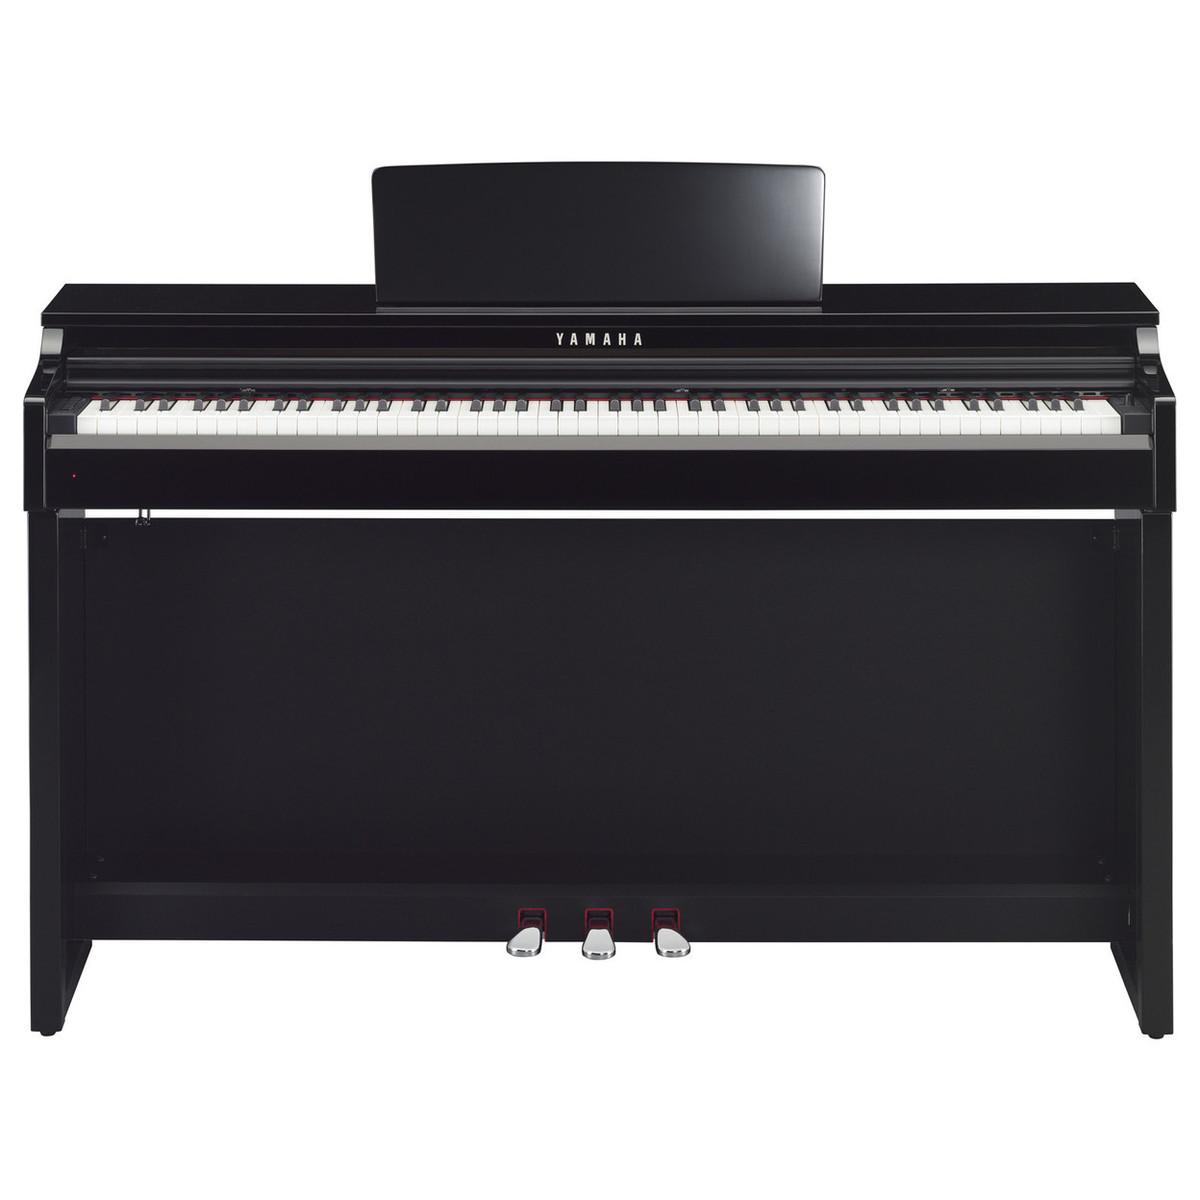 Yamaha clp525 clavinova digital piano package polished for Yamaha digital piano clavinova